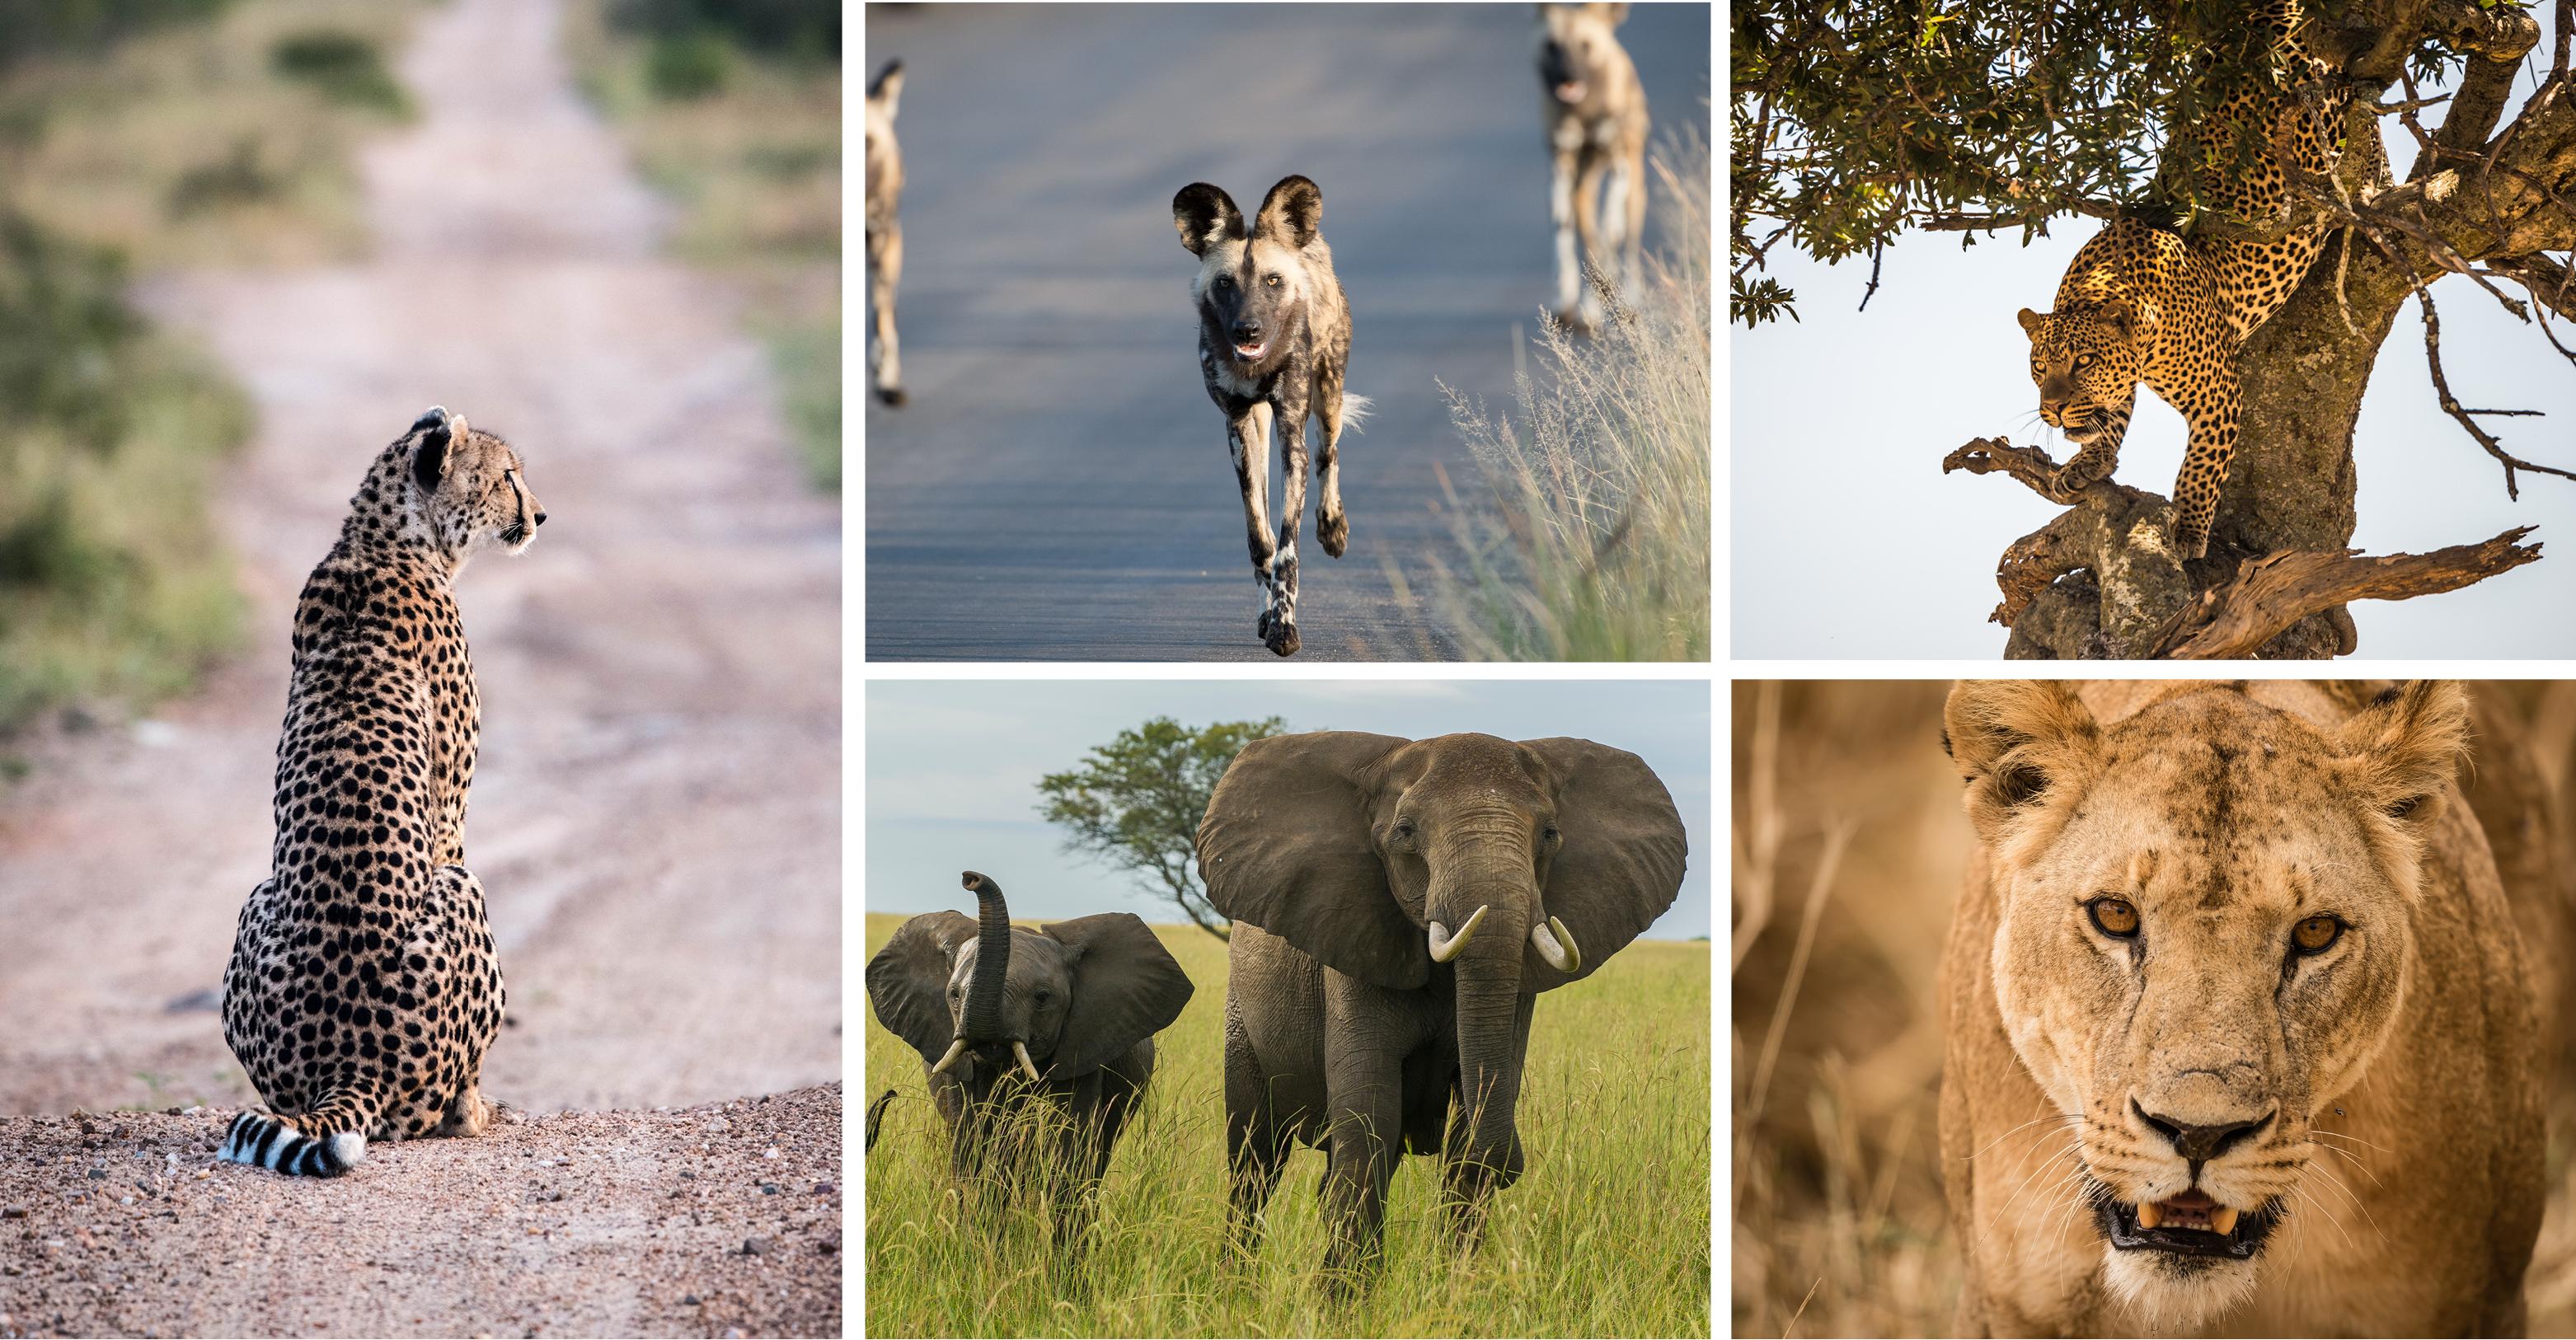 Cheetah © John Birch; African Wild Dog © John Birch; Leopard © Nick Dale; African Elepahnt © Andreas Klotz; African Lion © Jacques-Andre Dupont